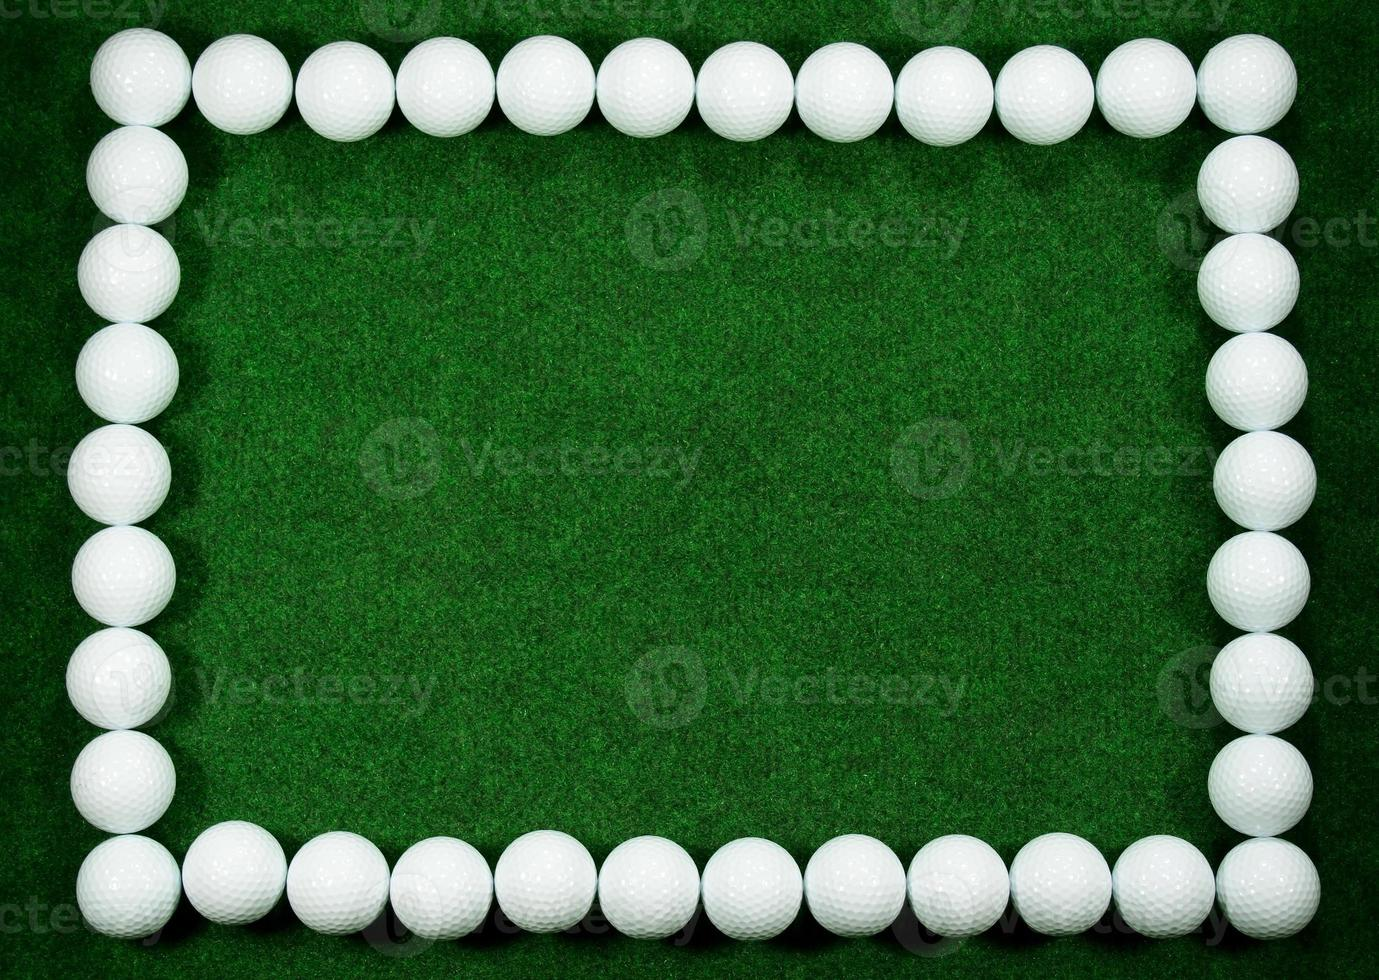 Golfrahmen foto